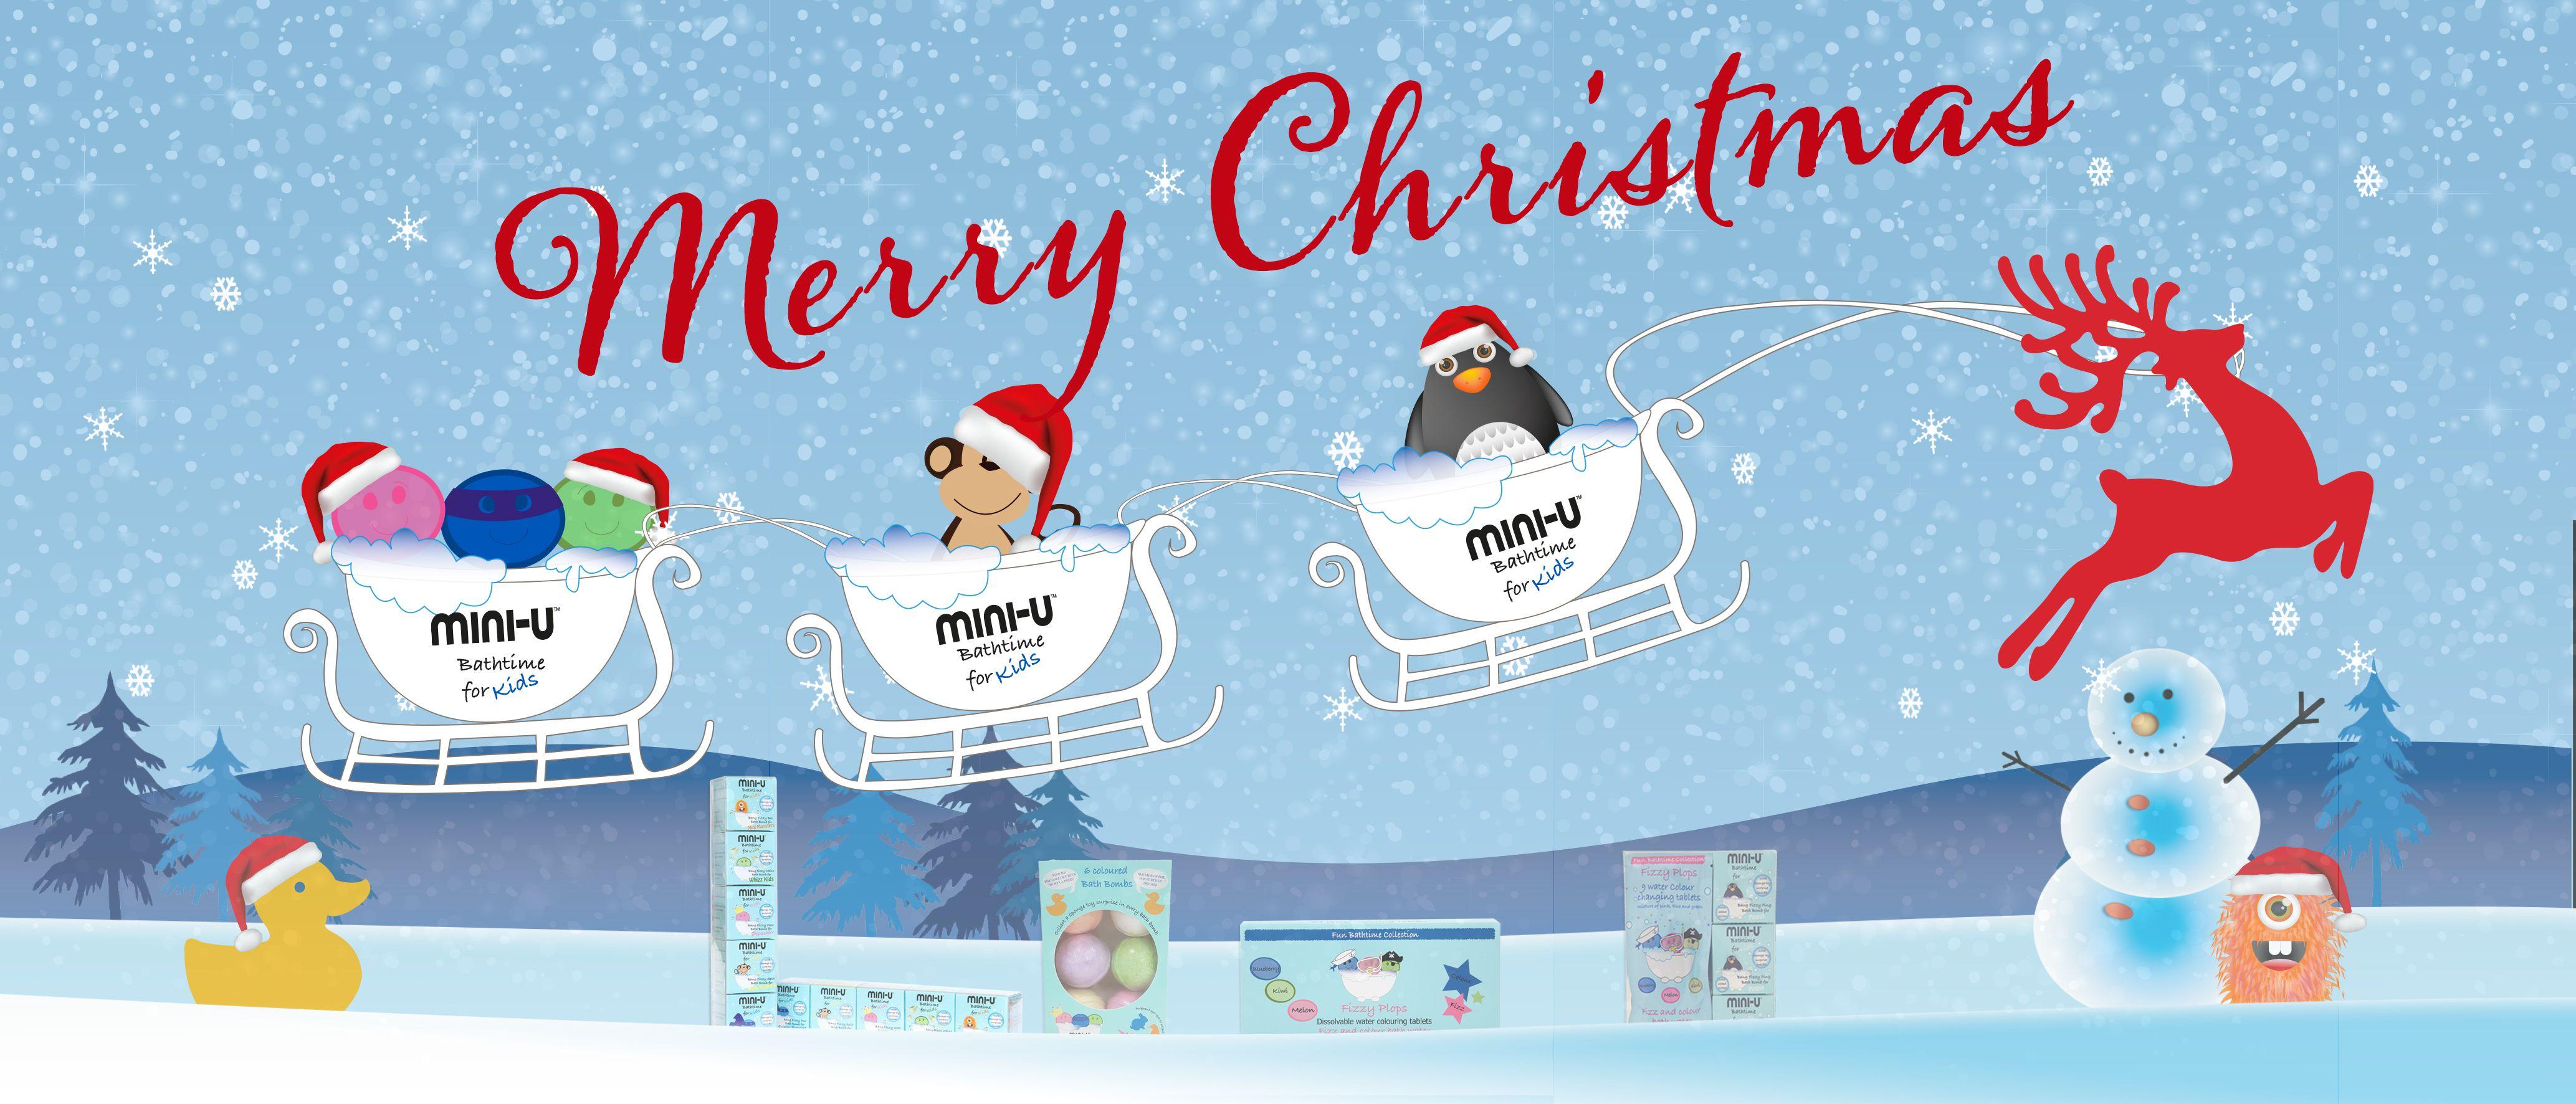 Merry-Christmas-from-Mini-U